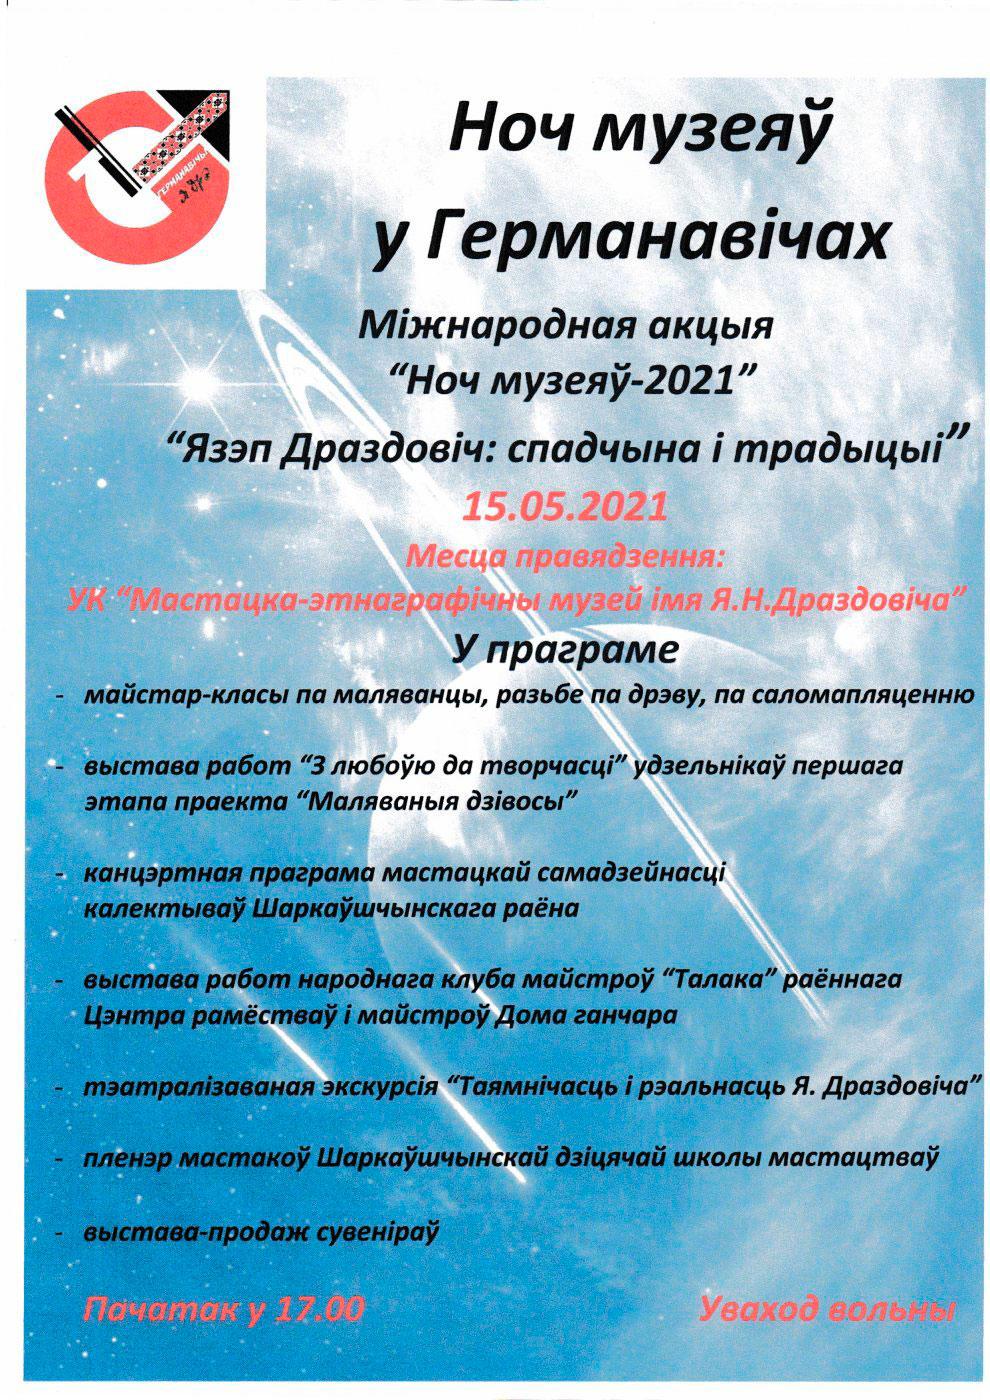 Ночь музеев 2021 в Германовичах